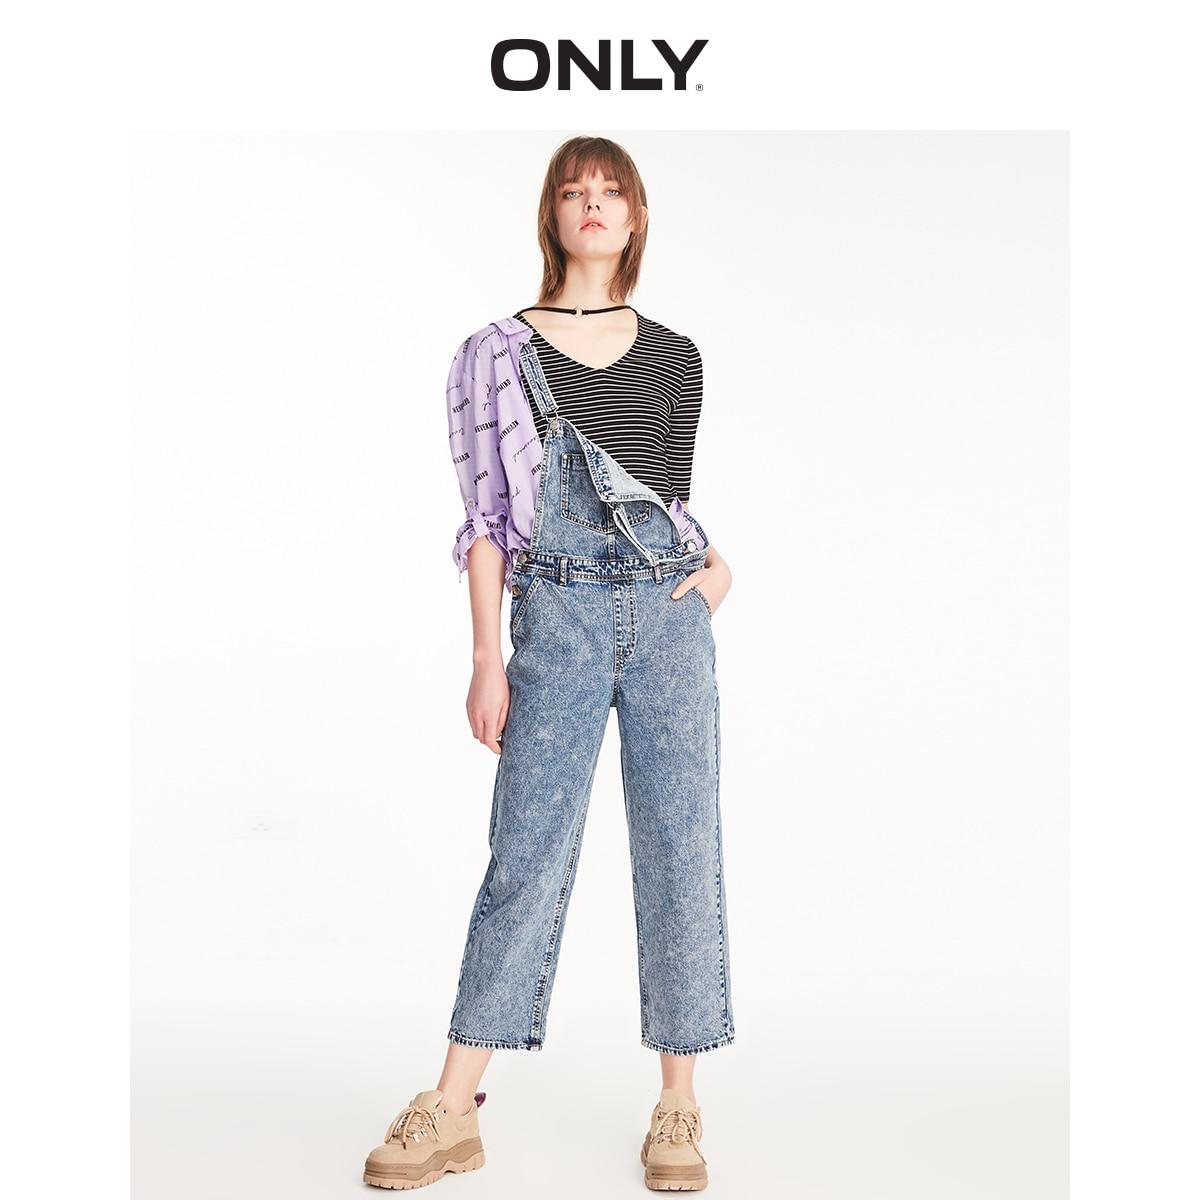 ONLY Women's Loose Straight Fit 100% Cotton Capri Denim Overalls | 11927K502